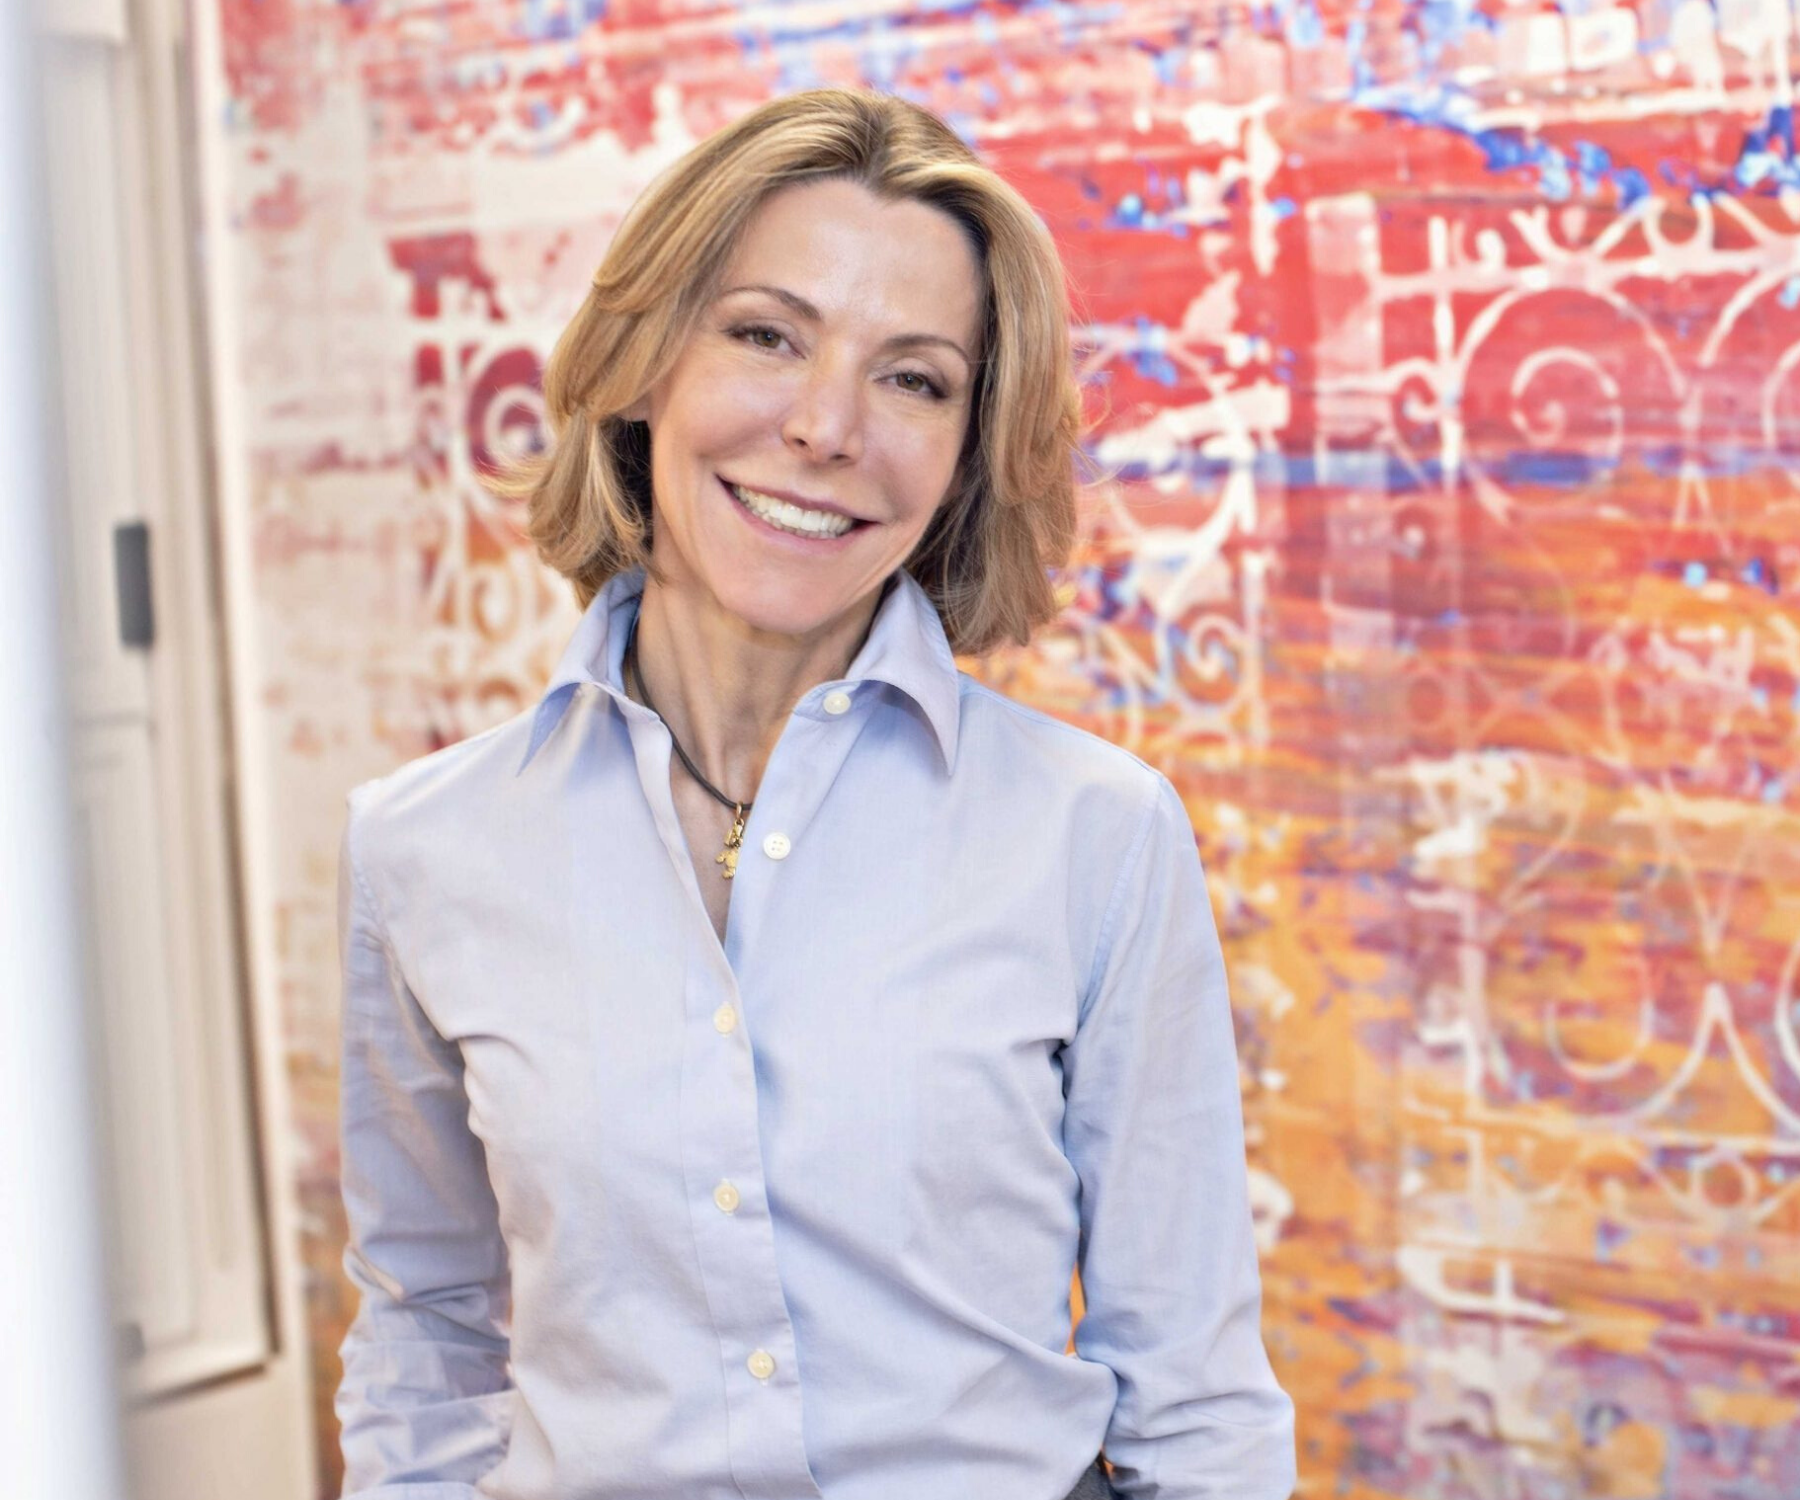 Dr. Emanuela Corielli, DDS